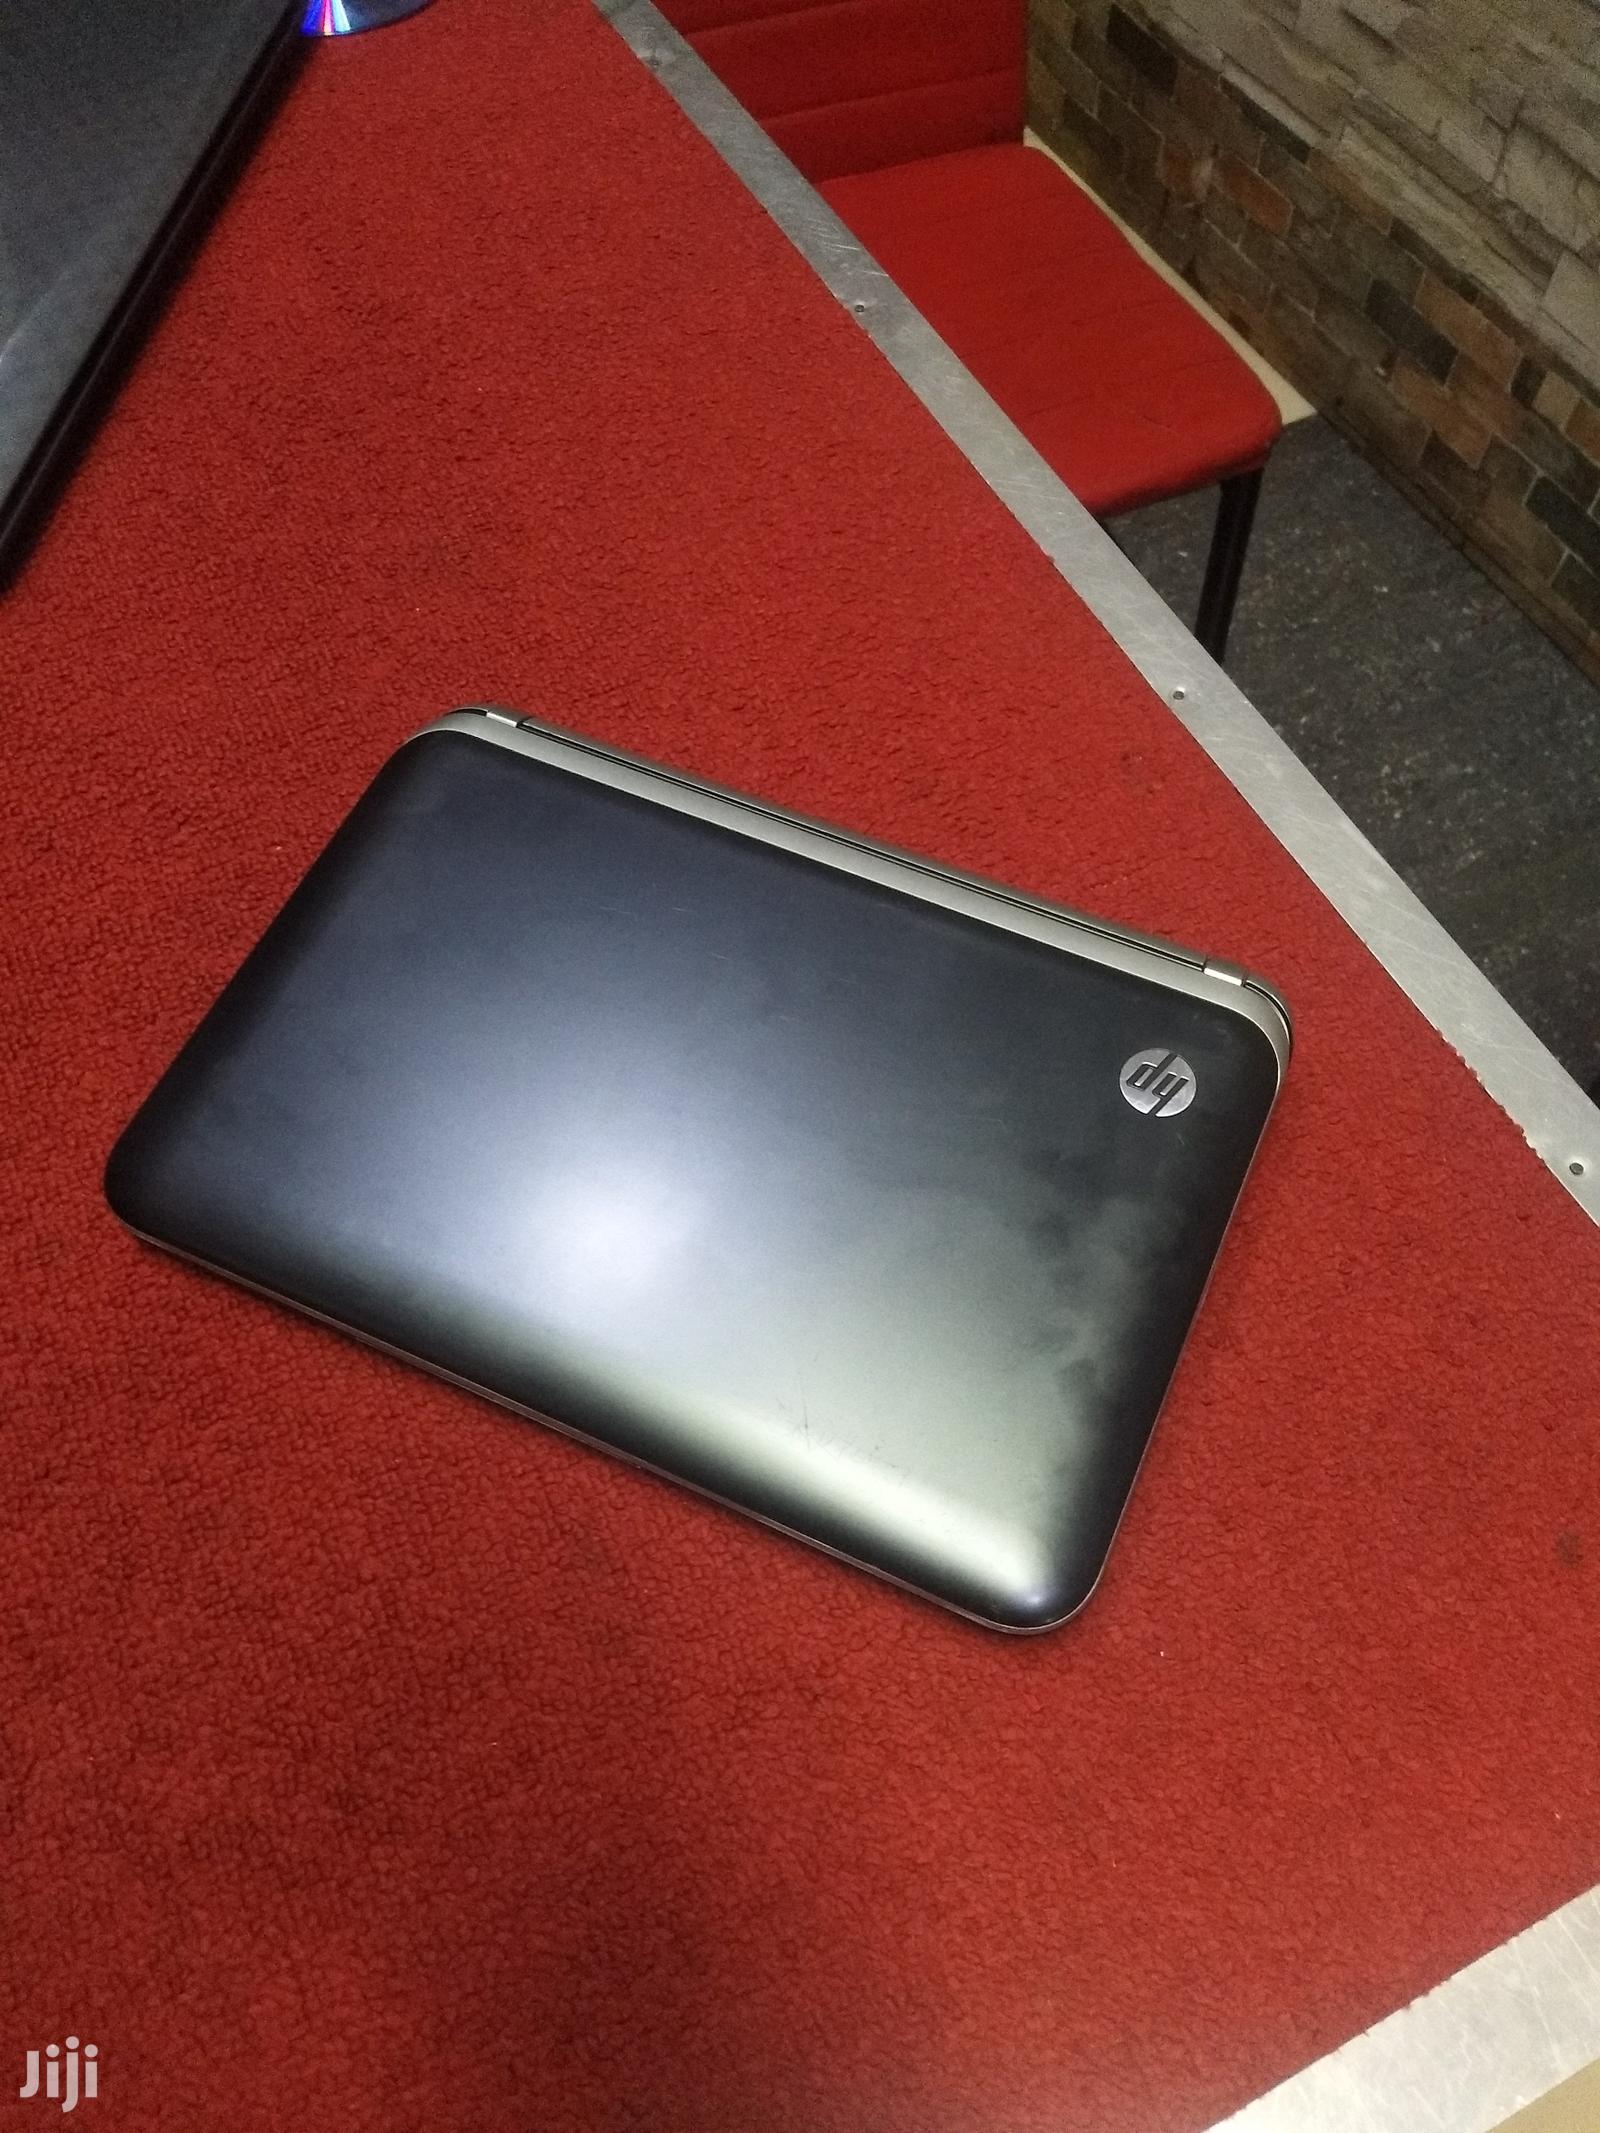 Laptop HP Mini 210 2GB Intel Atom HDD 160GB   Laptops & Computers for sale in Kampala, Central Region, Uganda